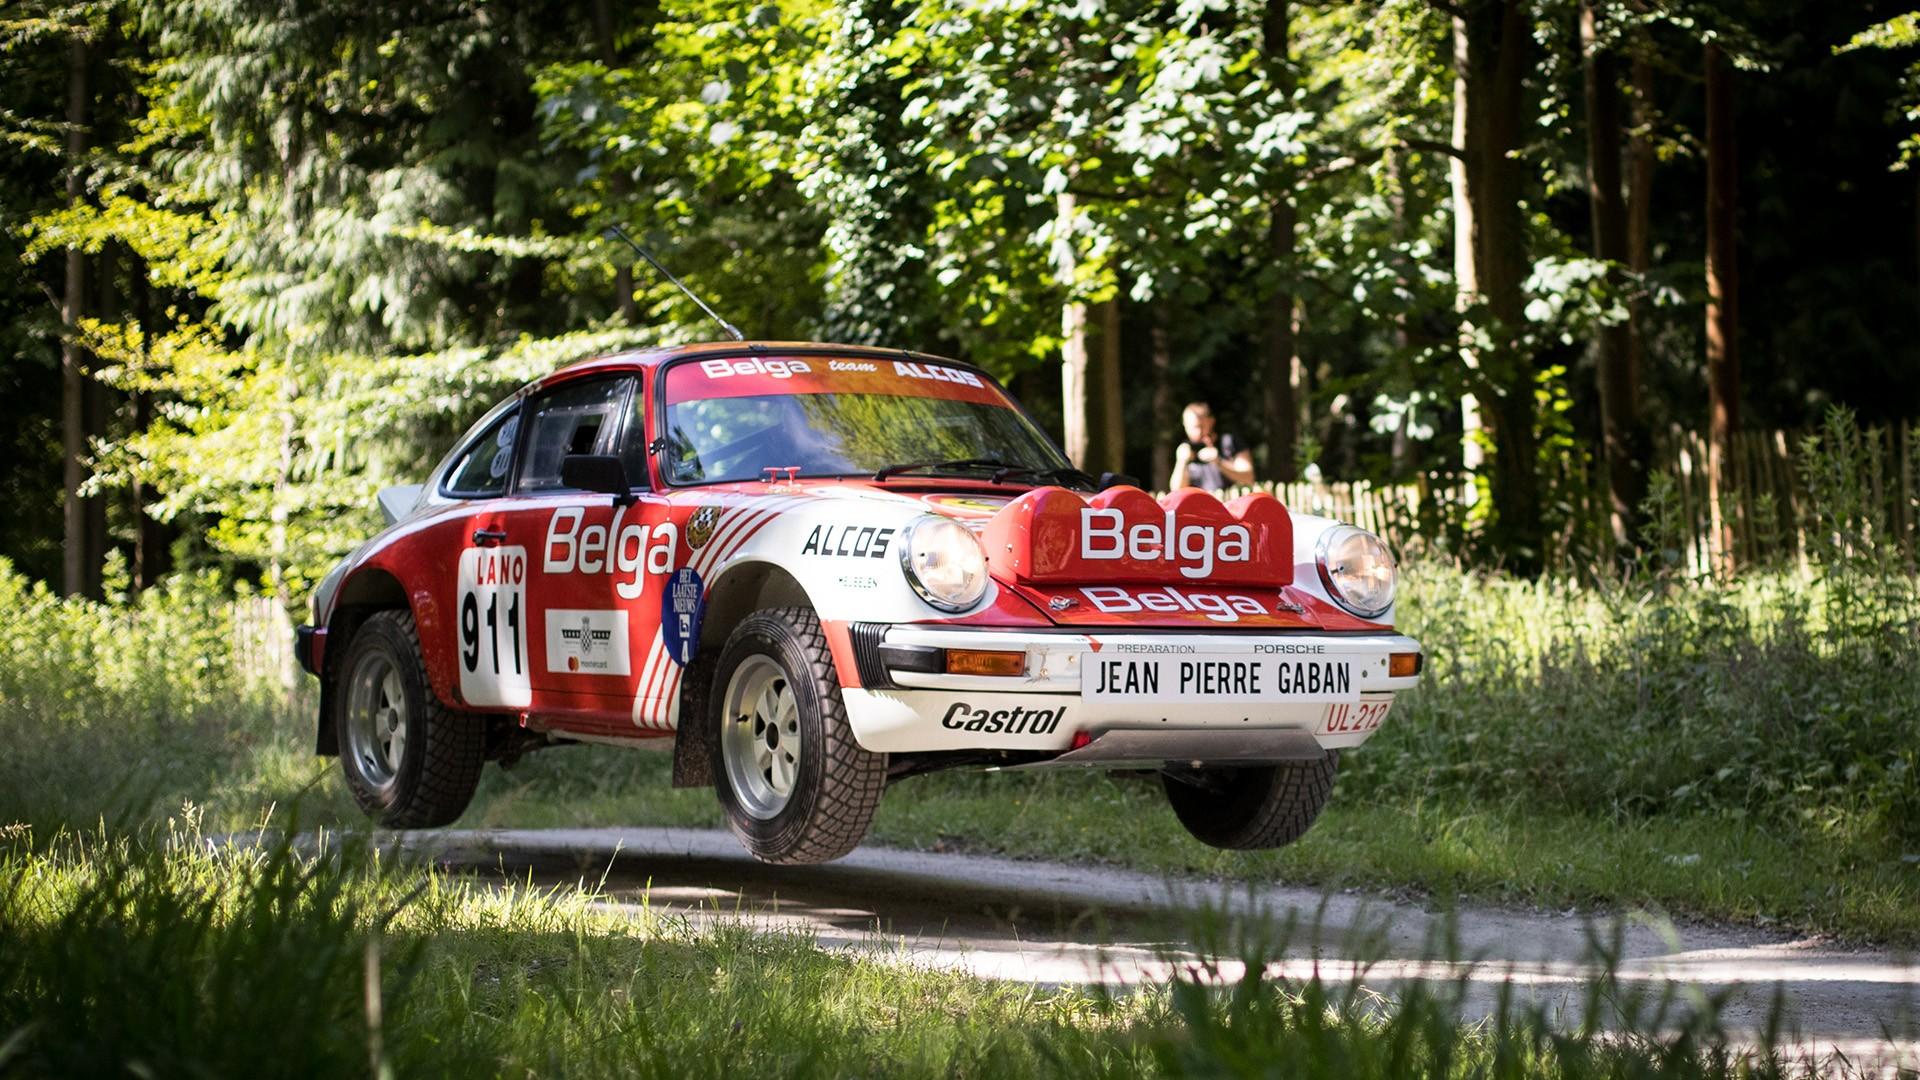 Goodwood Festival of Speed Porsche 70th Anniversary